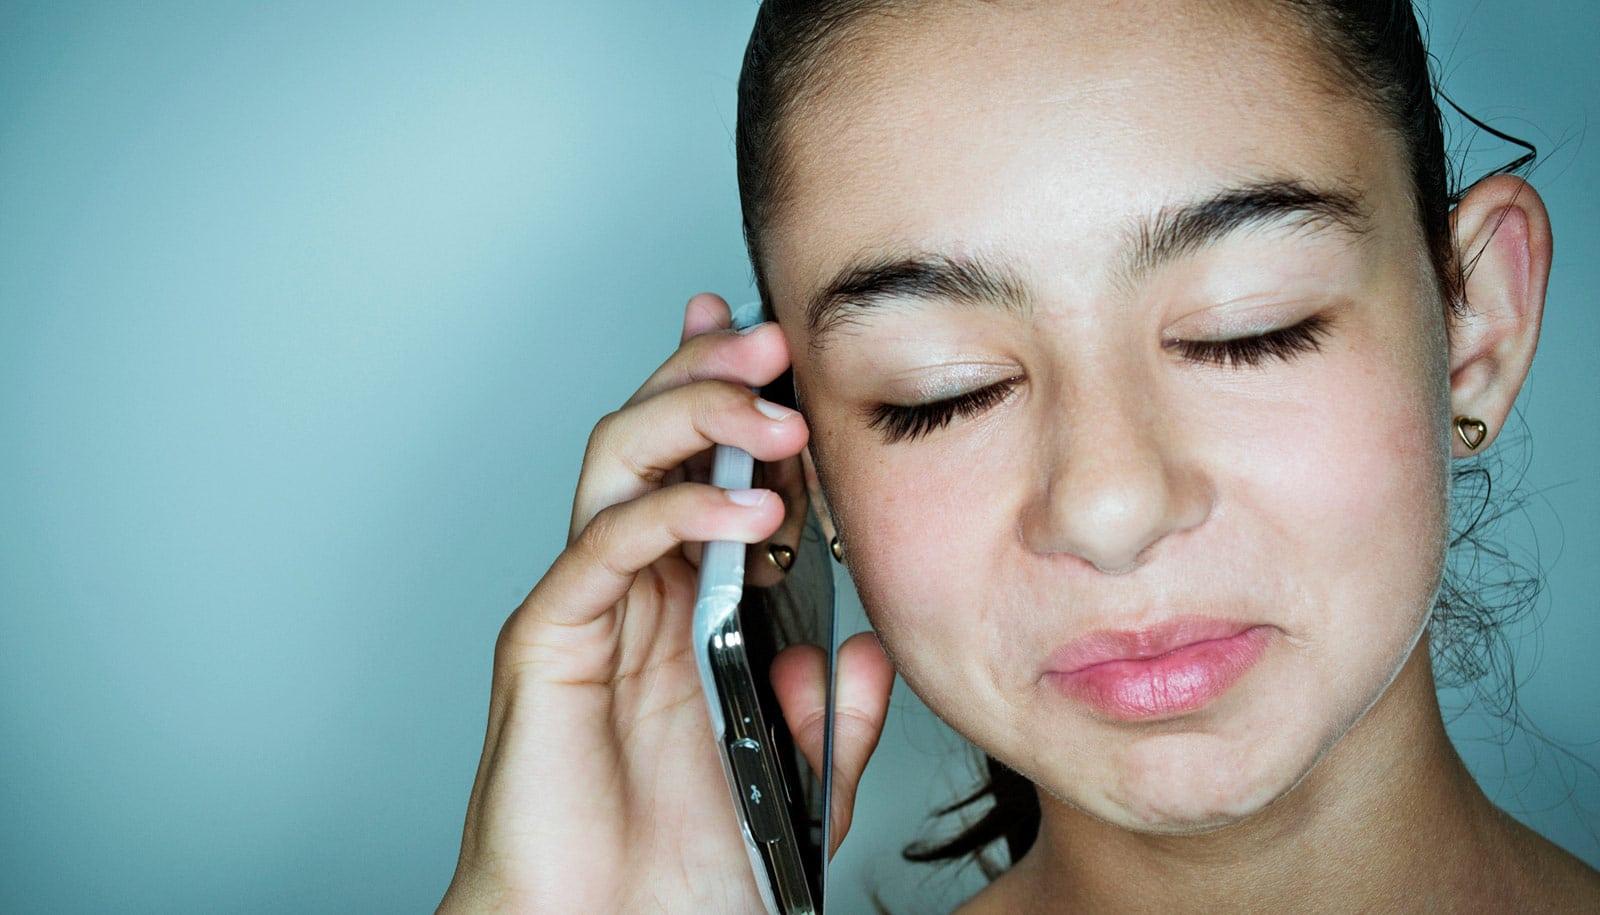 Teen girl phone emotion 1600